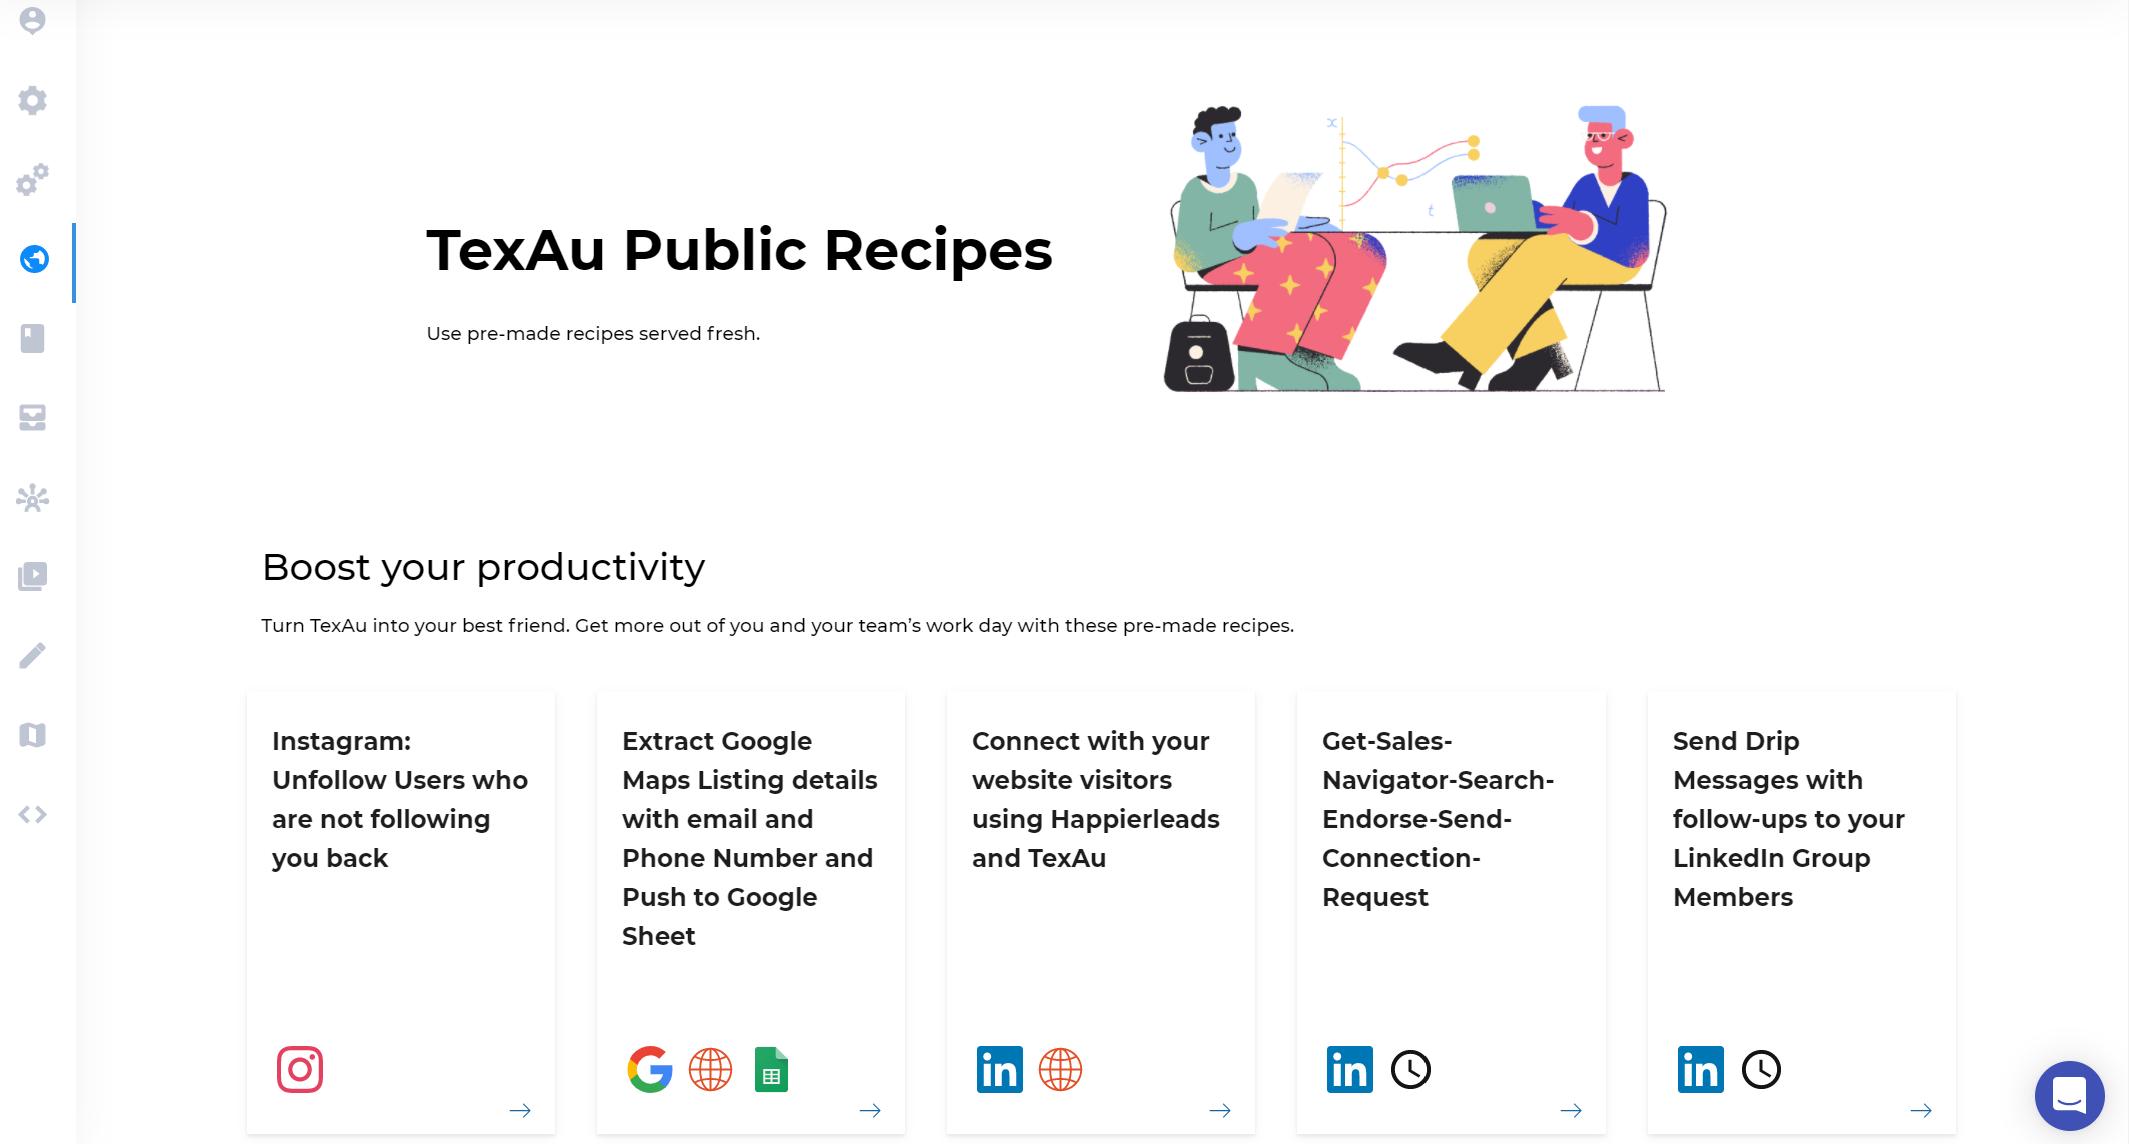 TexAu - List of Public Recipes